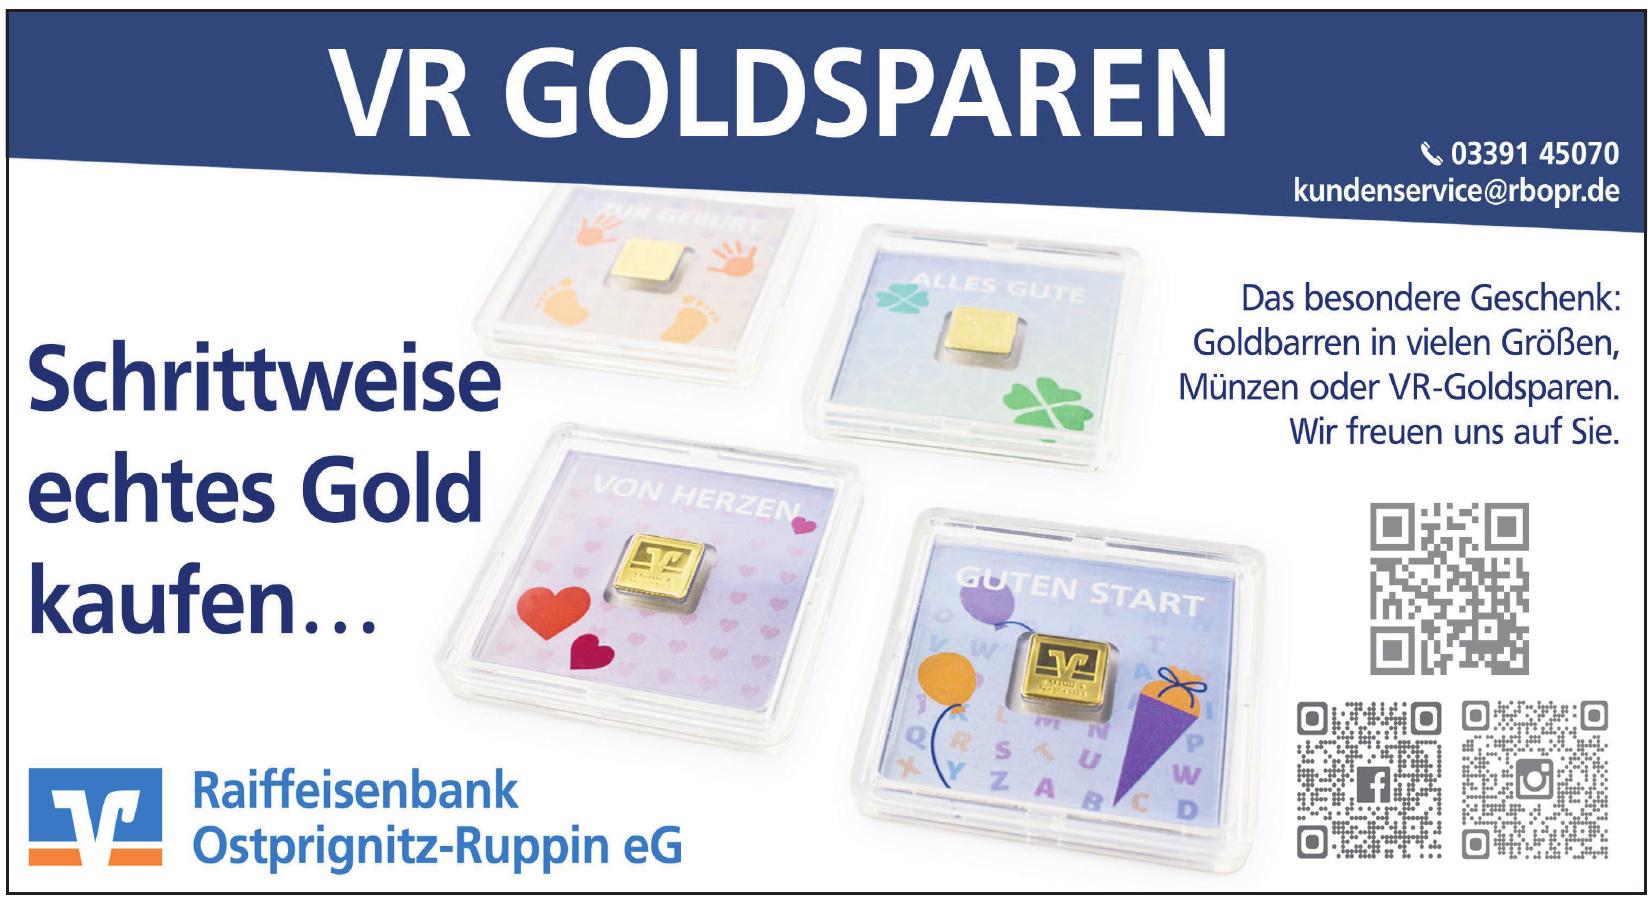 Raiffeisenbank Ostprignitz-Ruppin eG